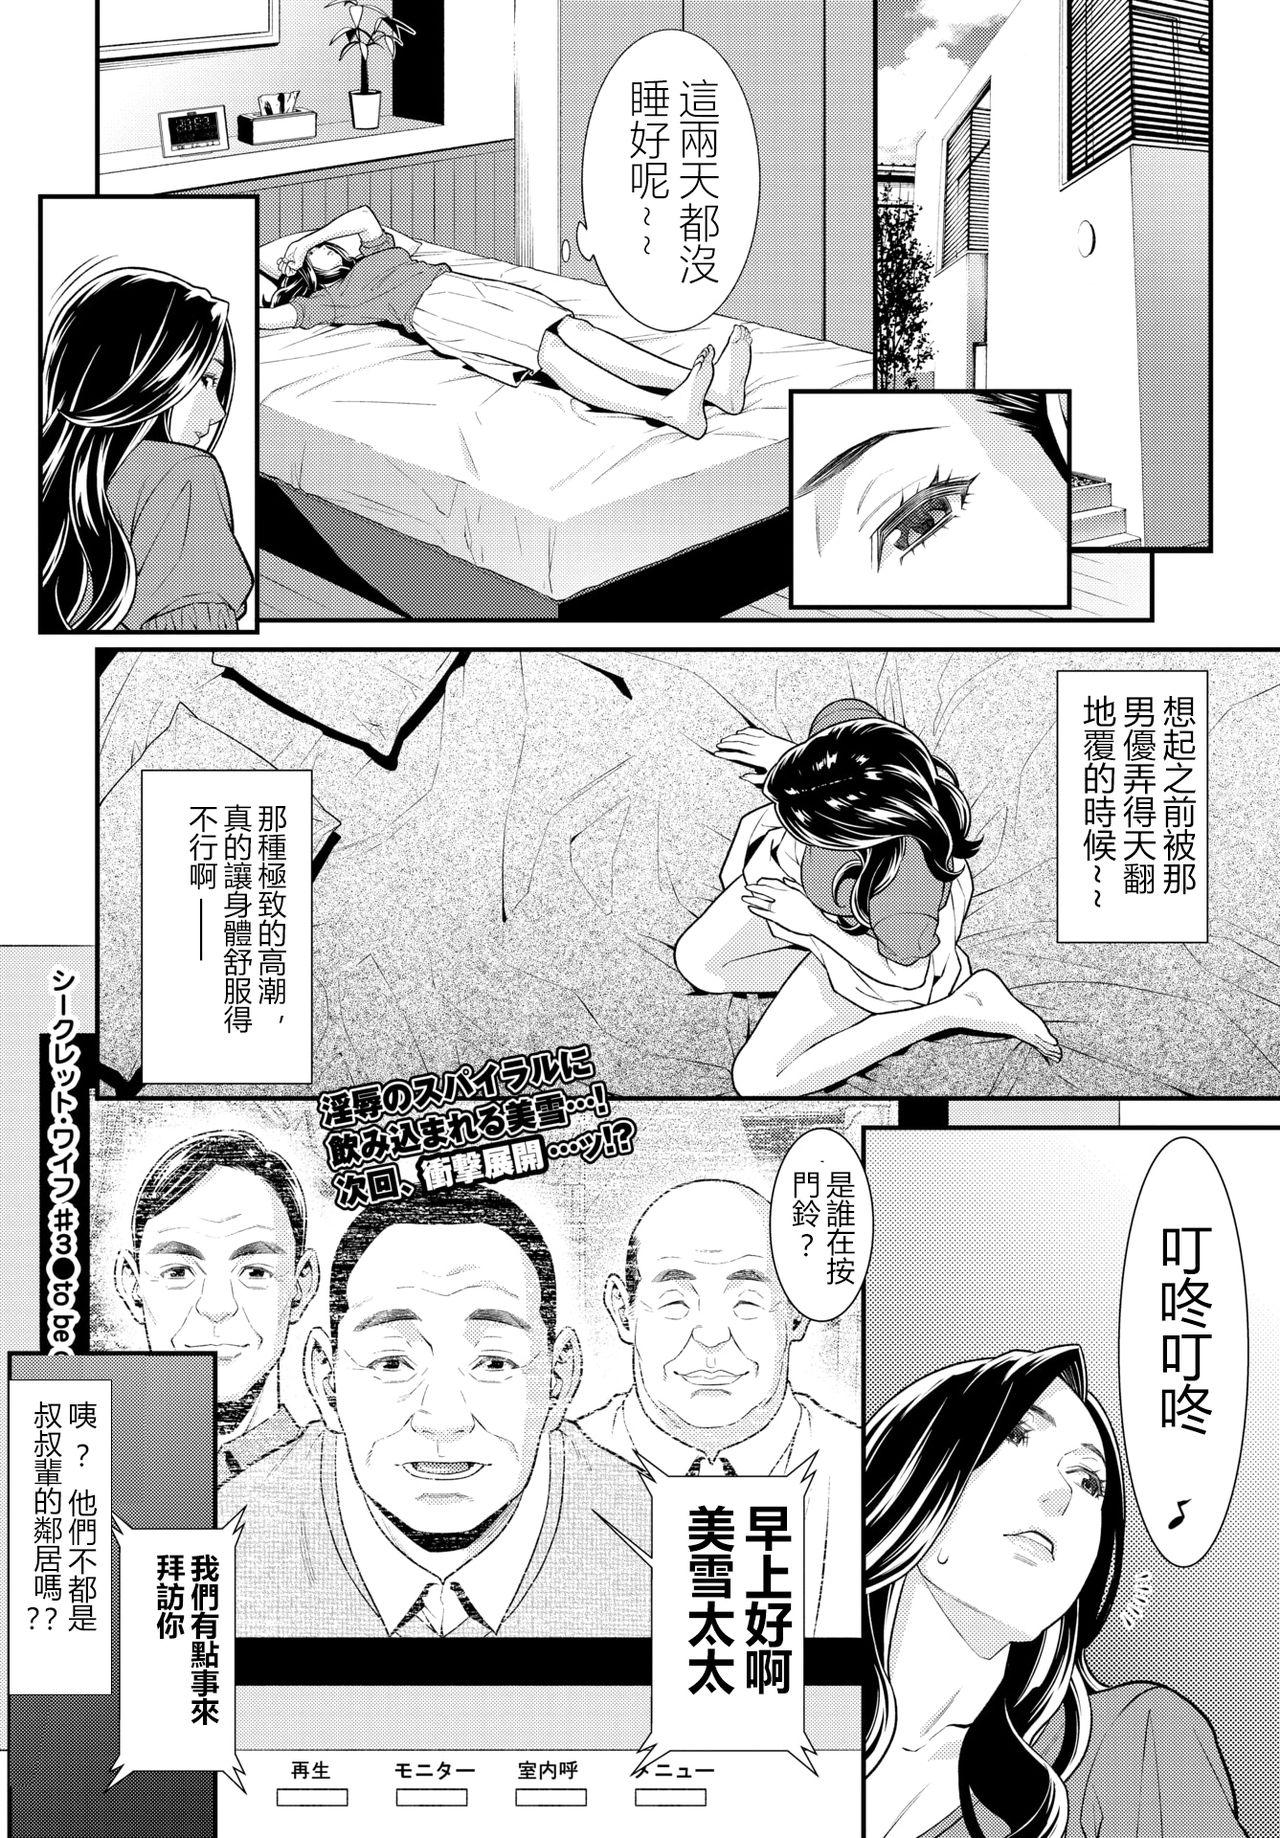 [Syuuen] Secret Wife  1-6 [Chinese][鼠灣漢化](210206最新修复完整版)【極品人妻NTR】 70